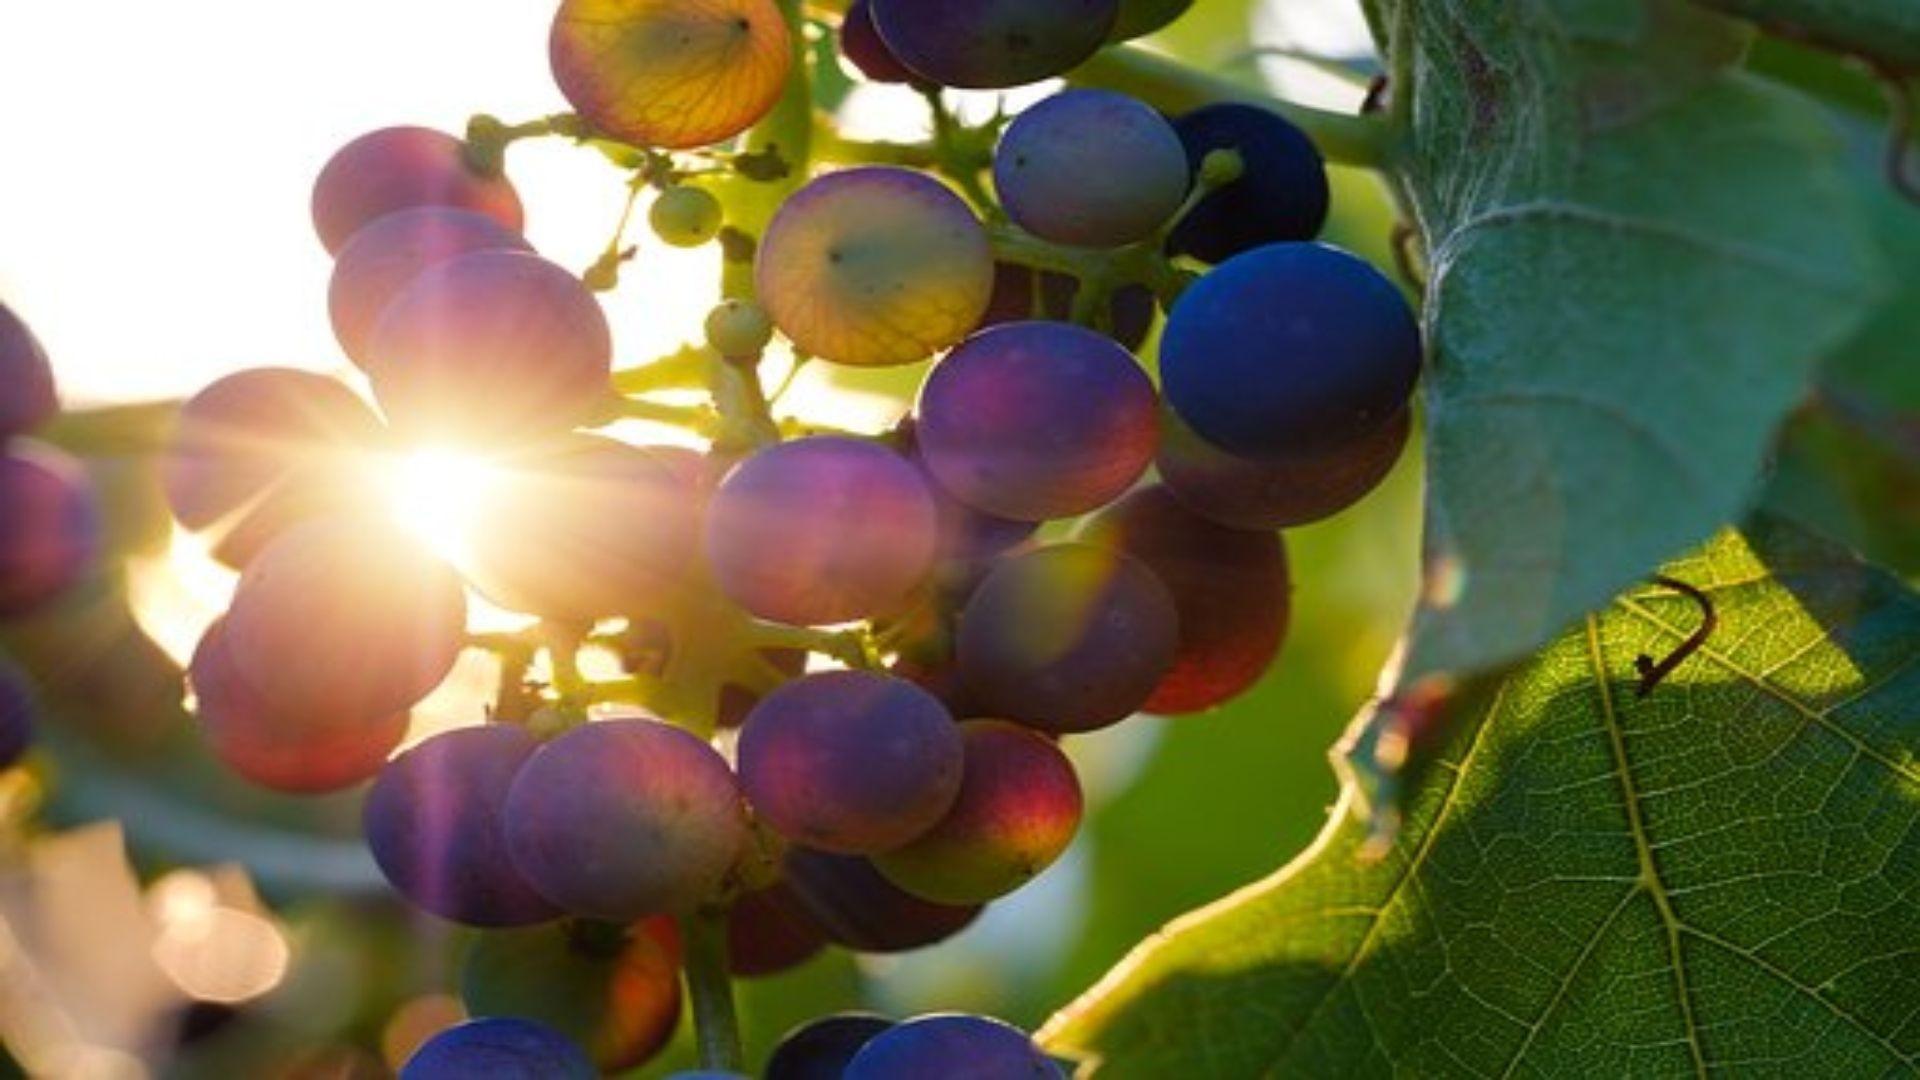 grapes-3550742__340 (1)